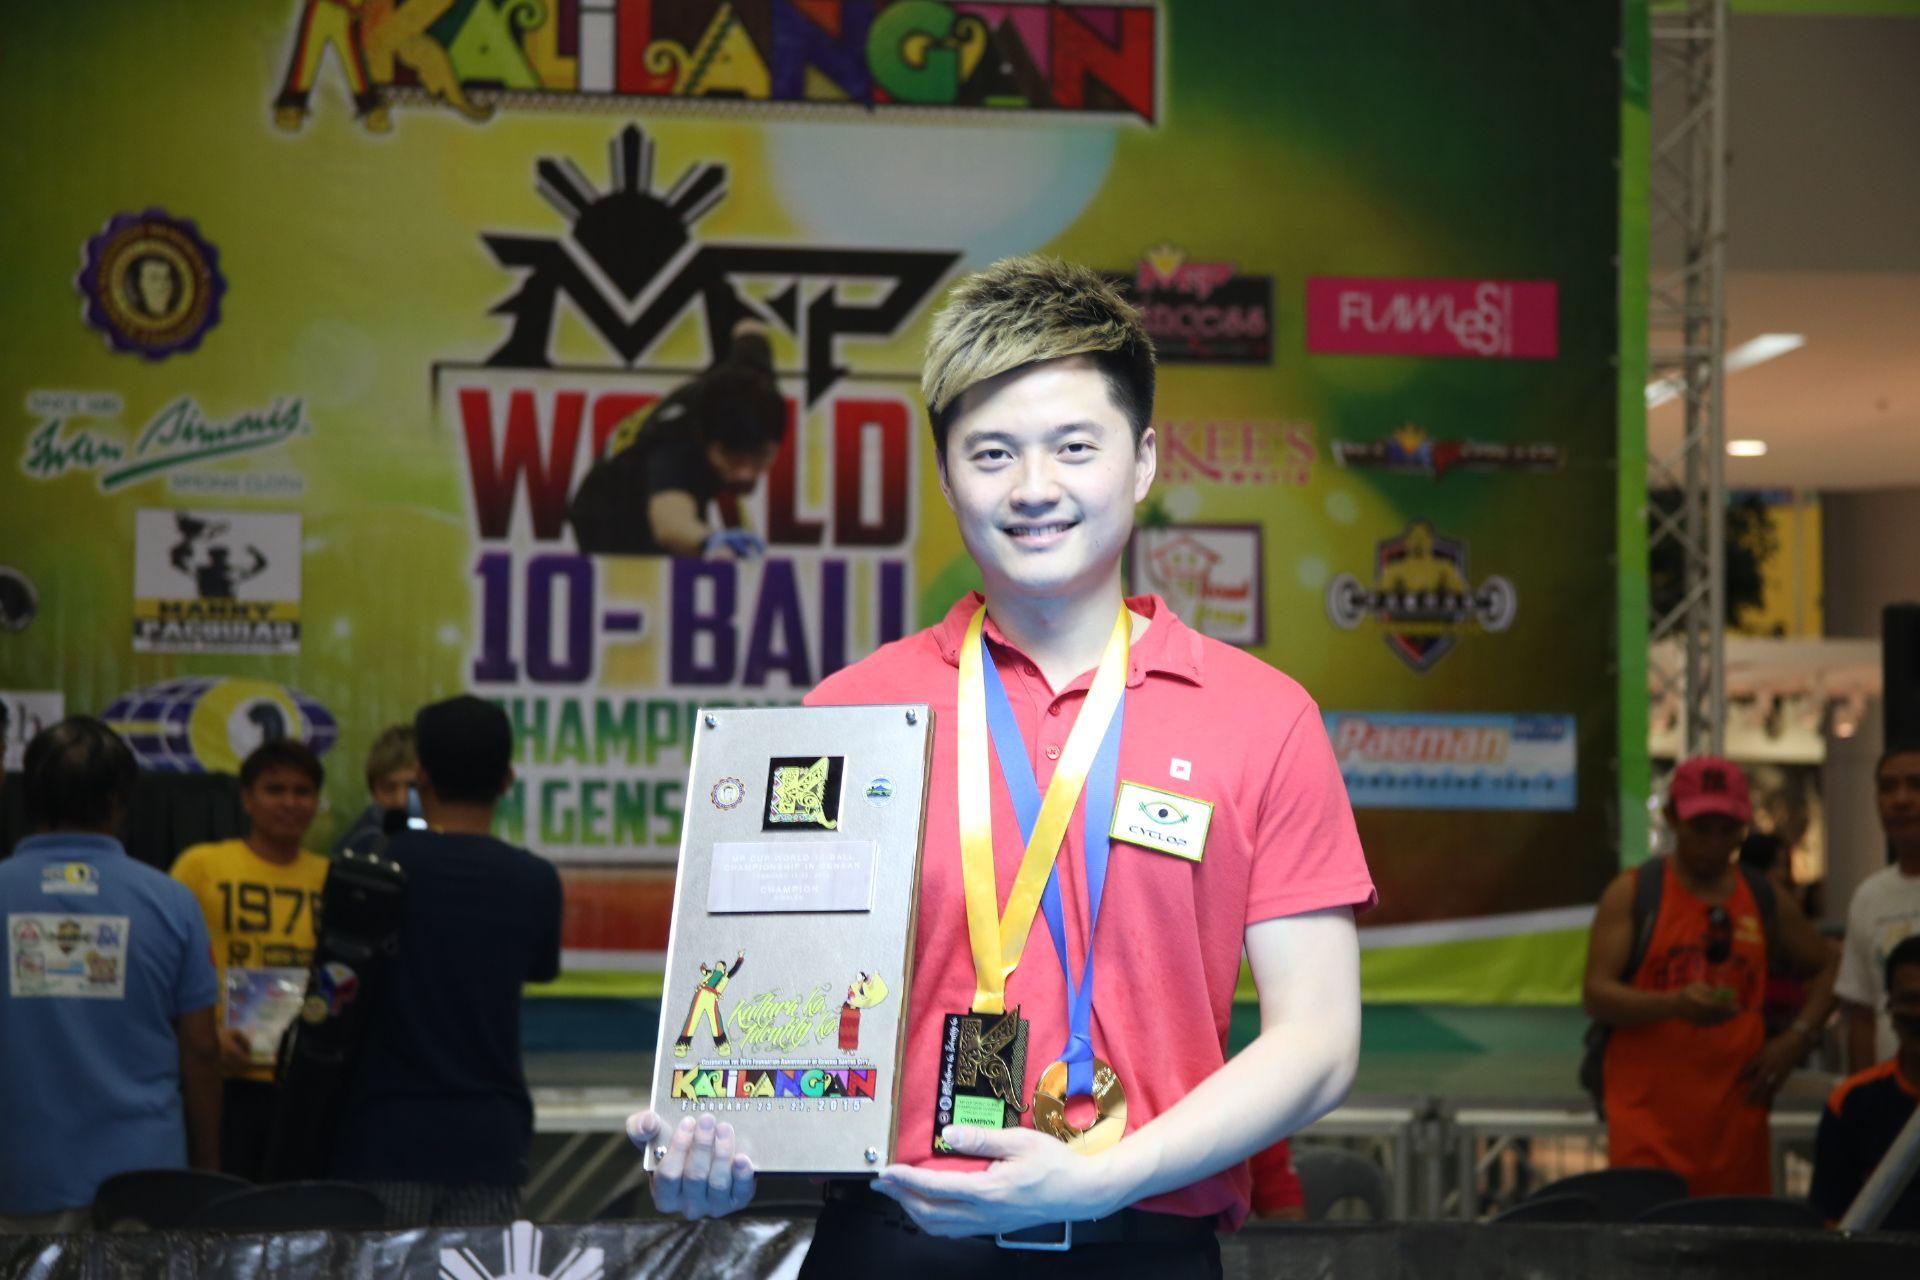 Ko Pin Yi outlasts Carlo Biado to crown himself new World 10-Ball champion